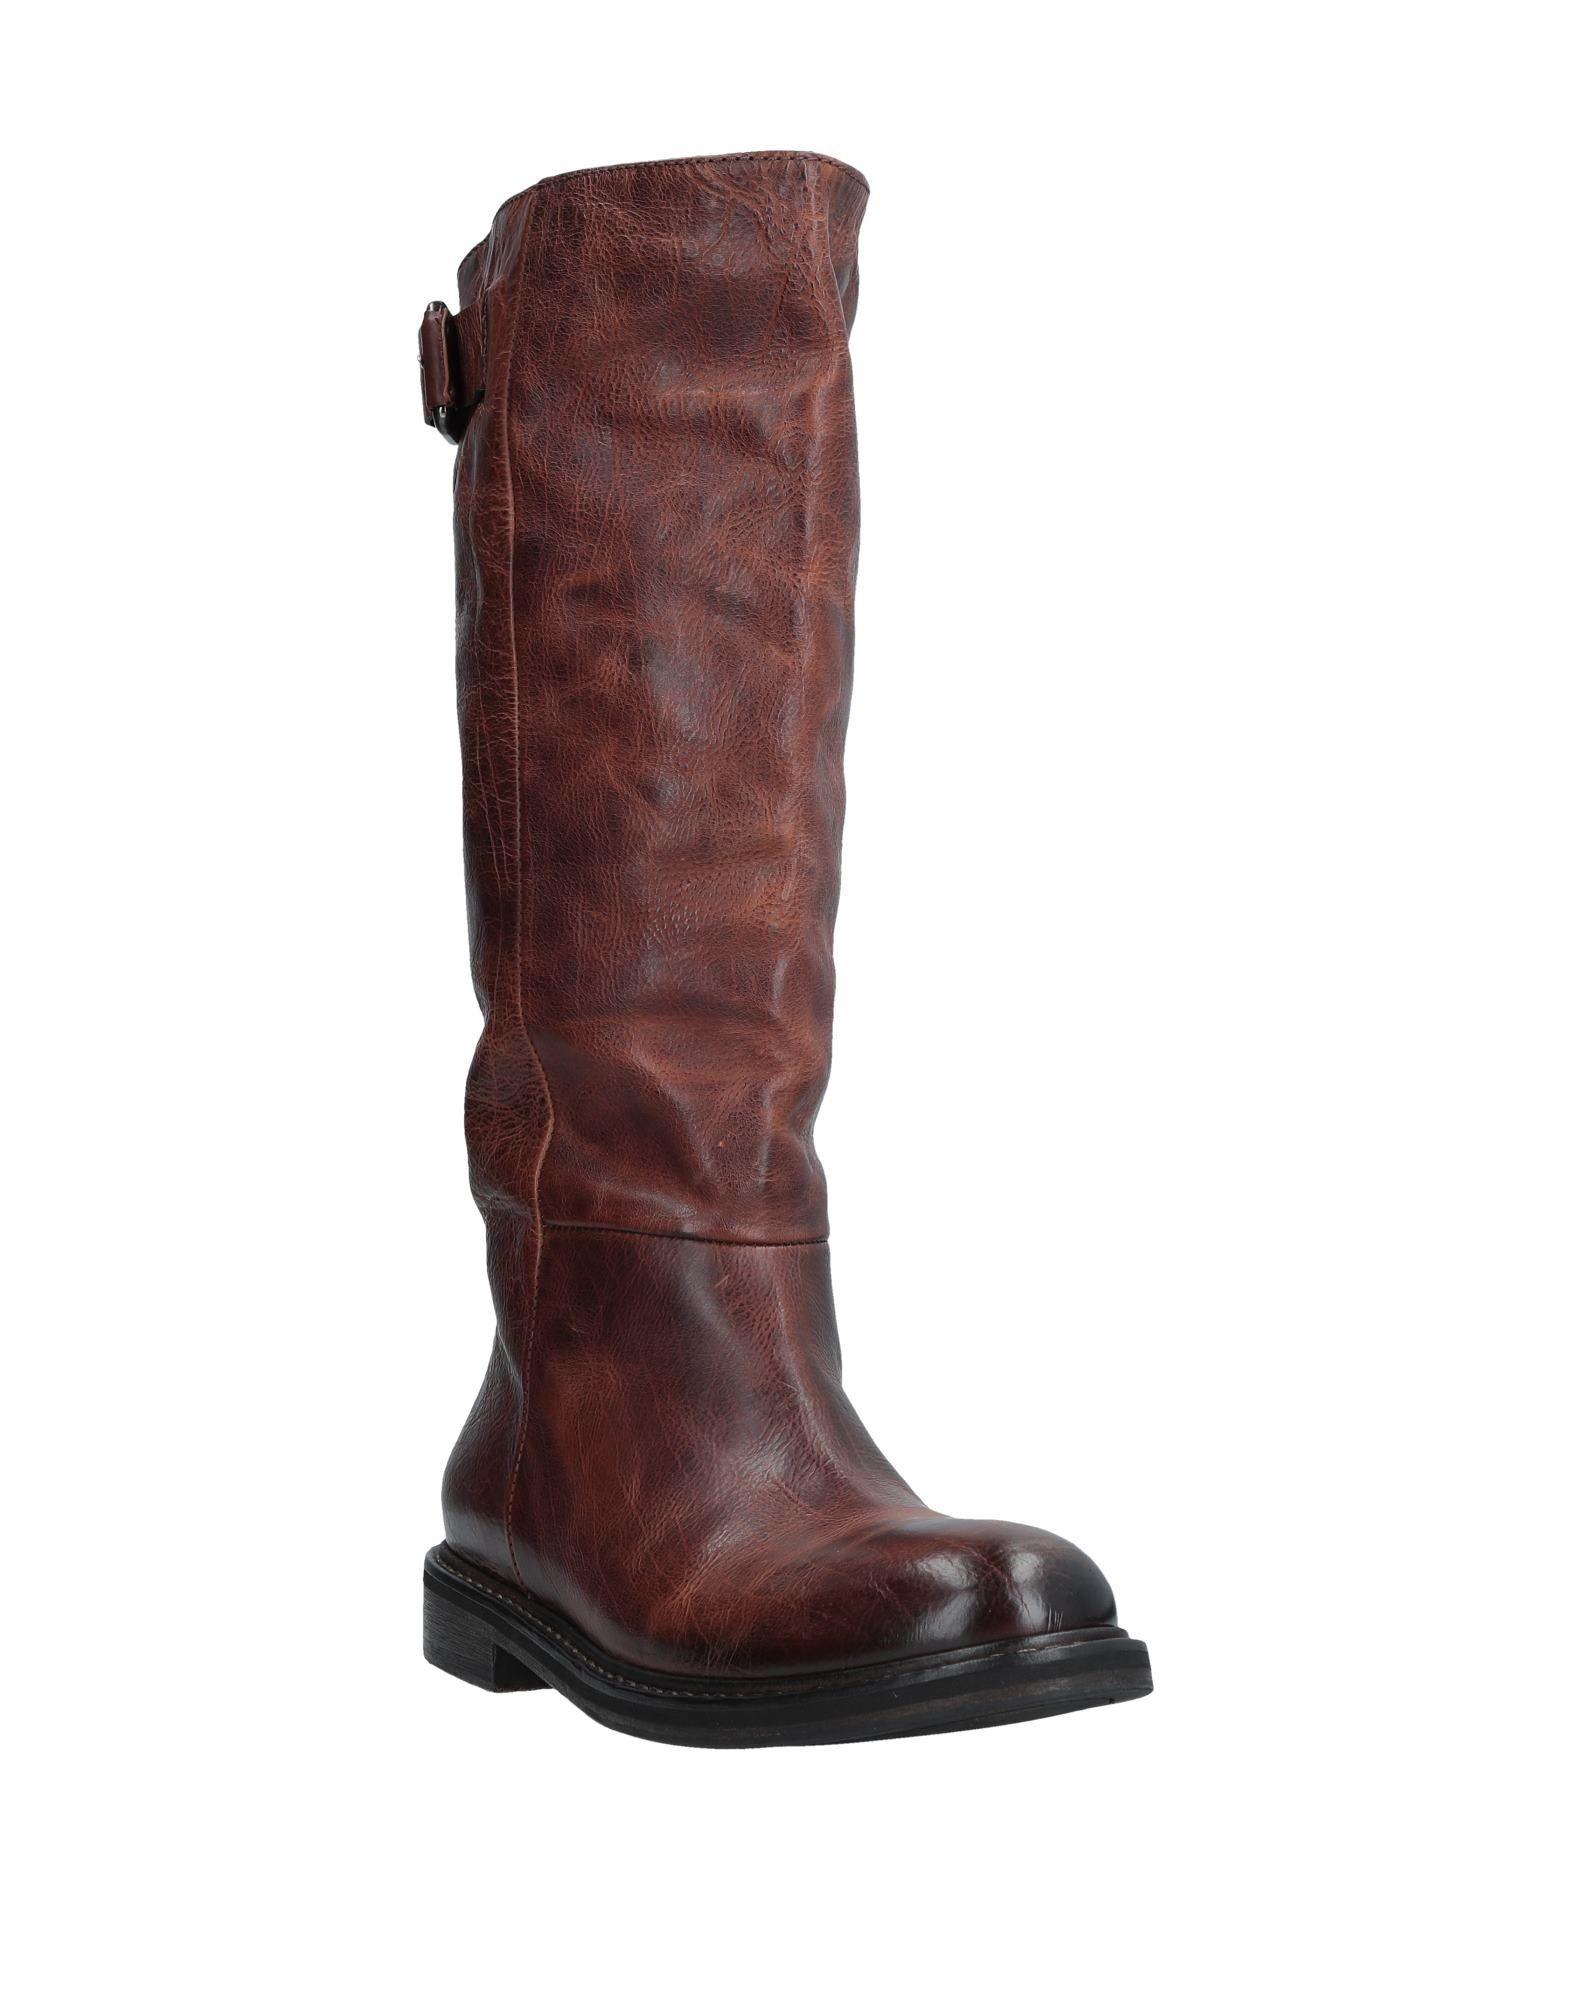 O.X.S. Stiefel strapazierfähige Damen  11536864CQGut aussehende strapazierfähige Stiefel Schuhe d303b7